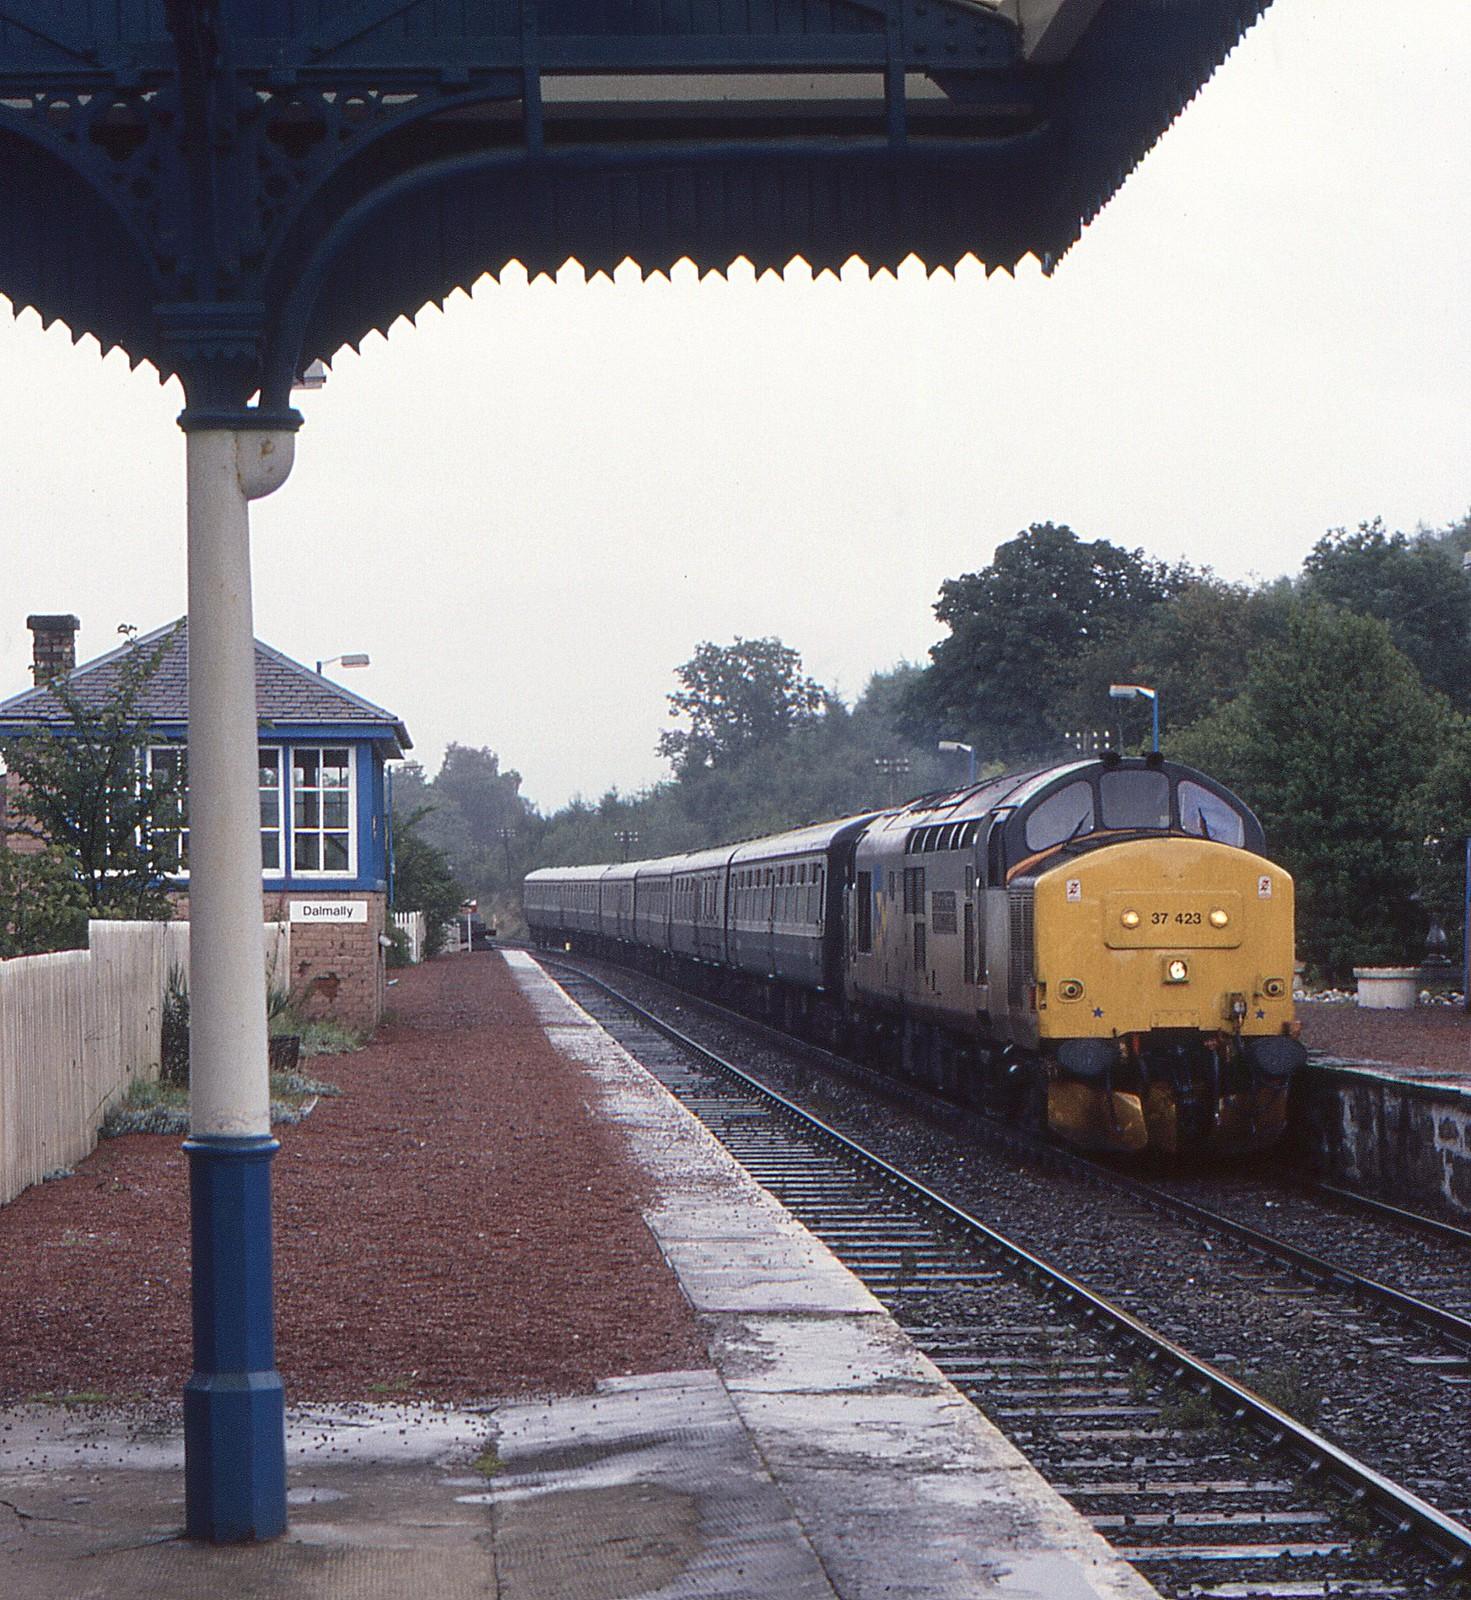 BR Class 37, 37423, Dalmally, 31st. August 1988 by Crewcastrian